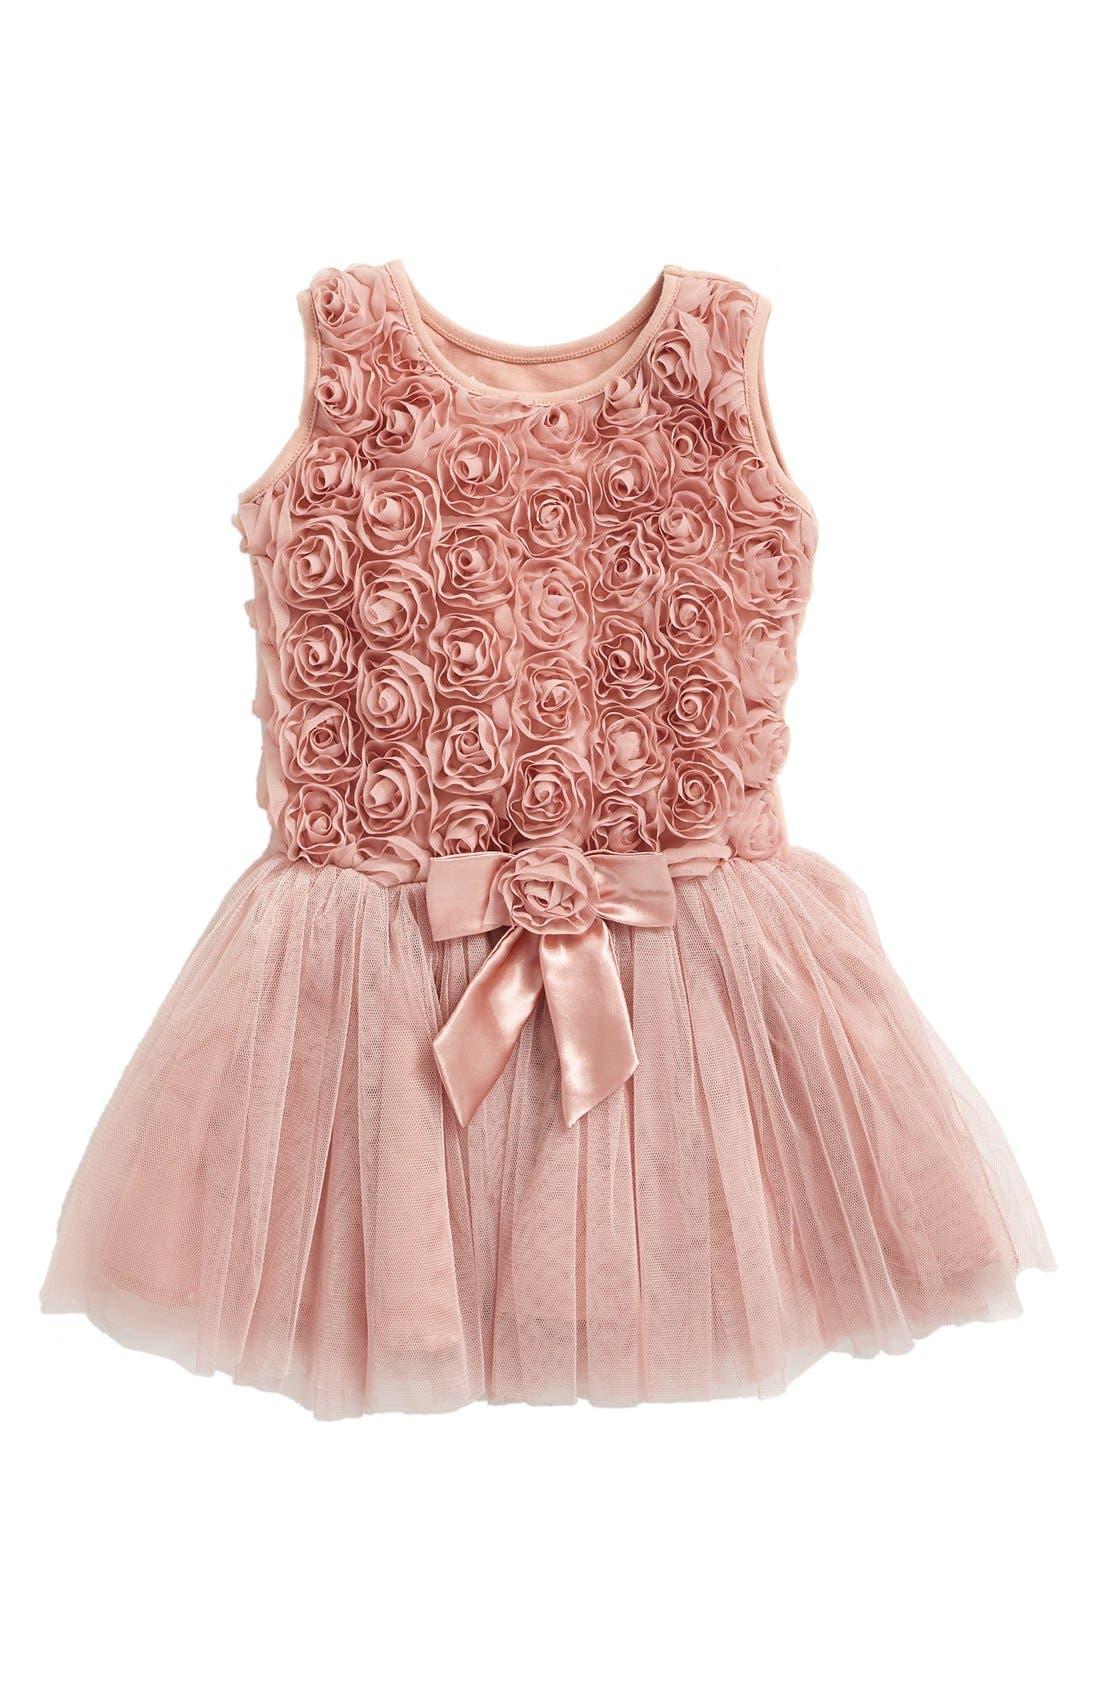 POPATU Ribbon Rosette Tutu Dress, Main, color, DUSTY PINK